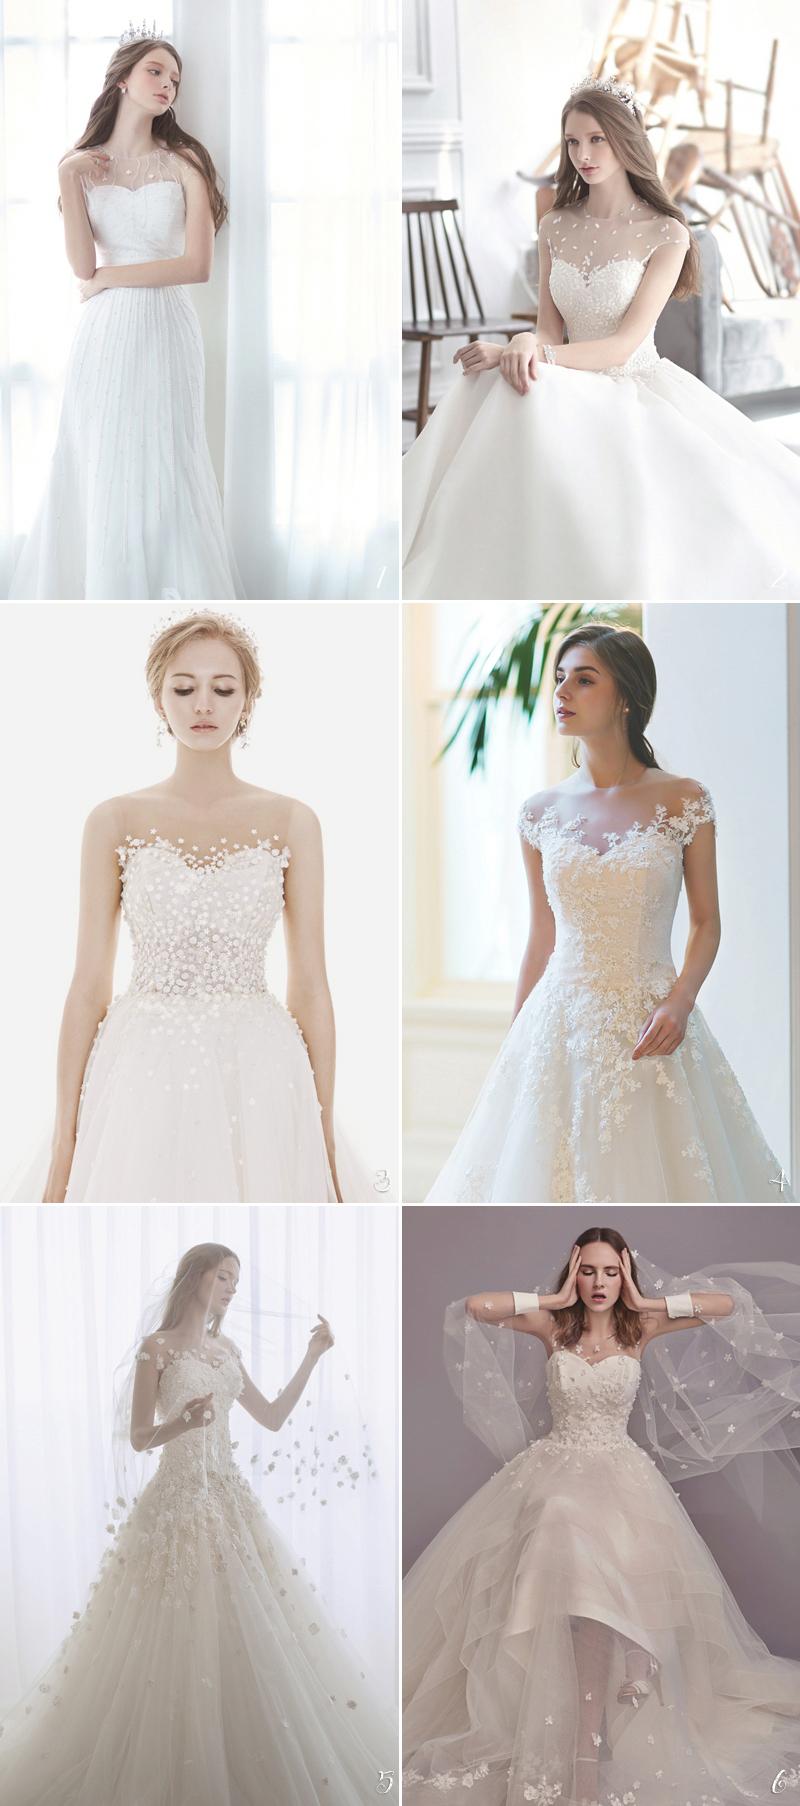 Illusion Neckline for romatic wedding dress